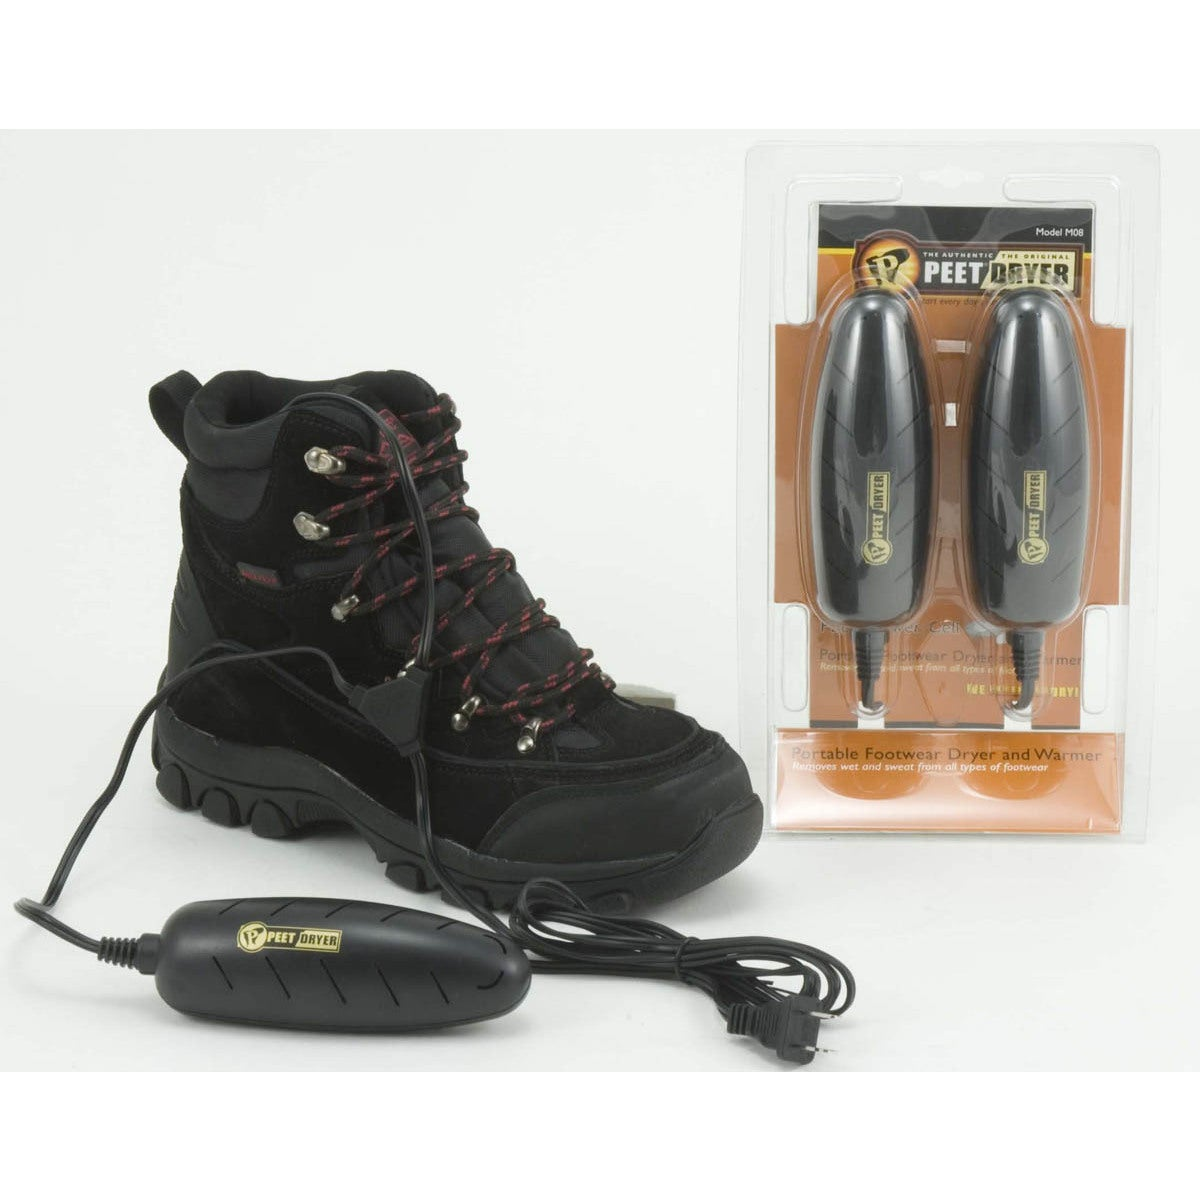 PEET Shoe Dryer Power Cell Dryer for Low Cut Shoes (Black)